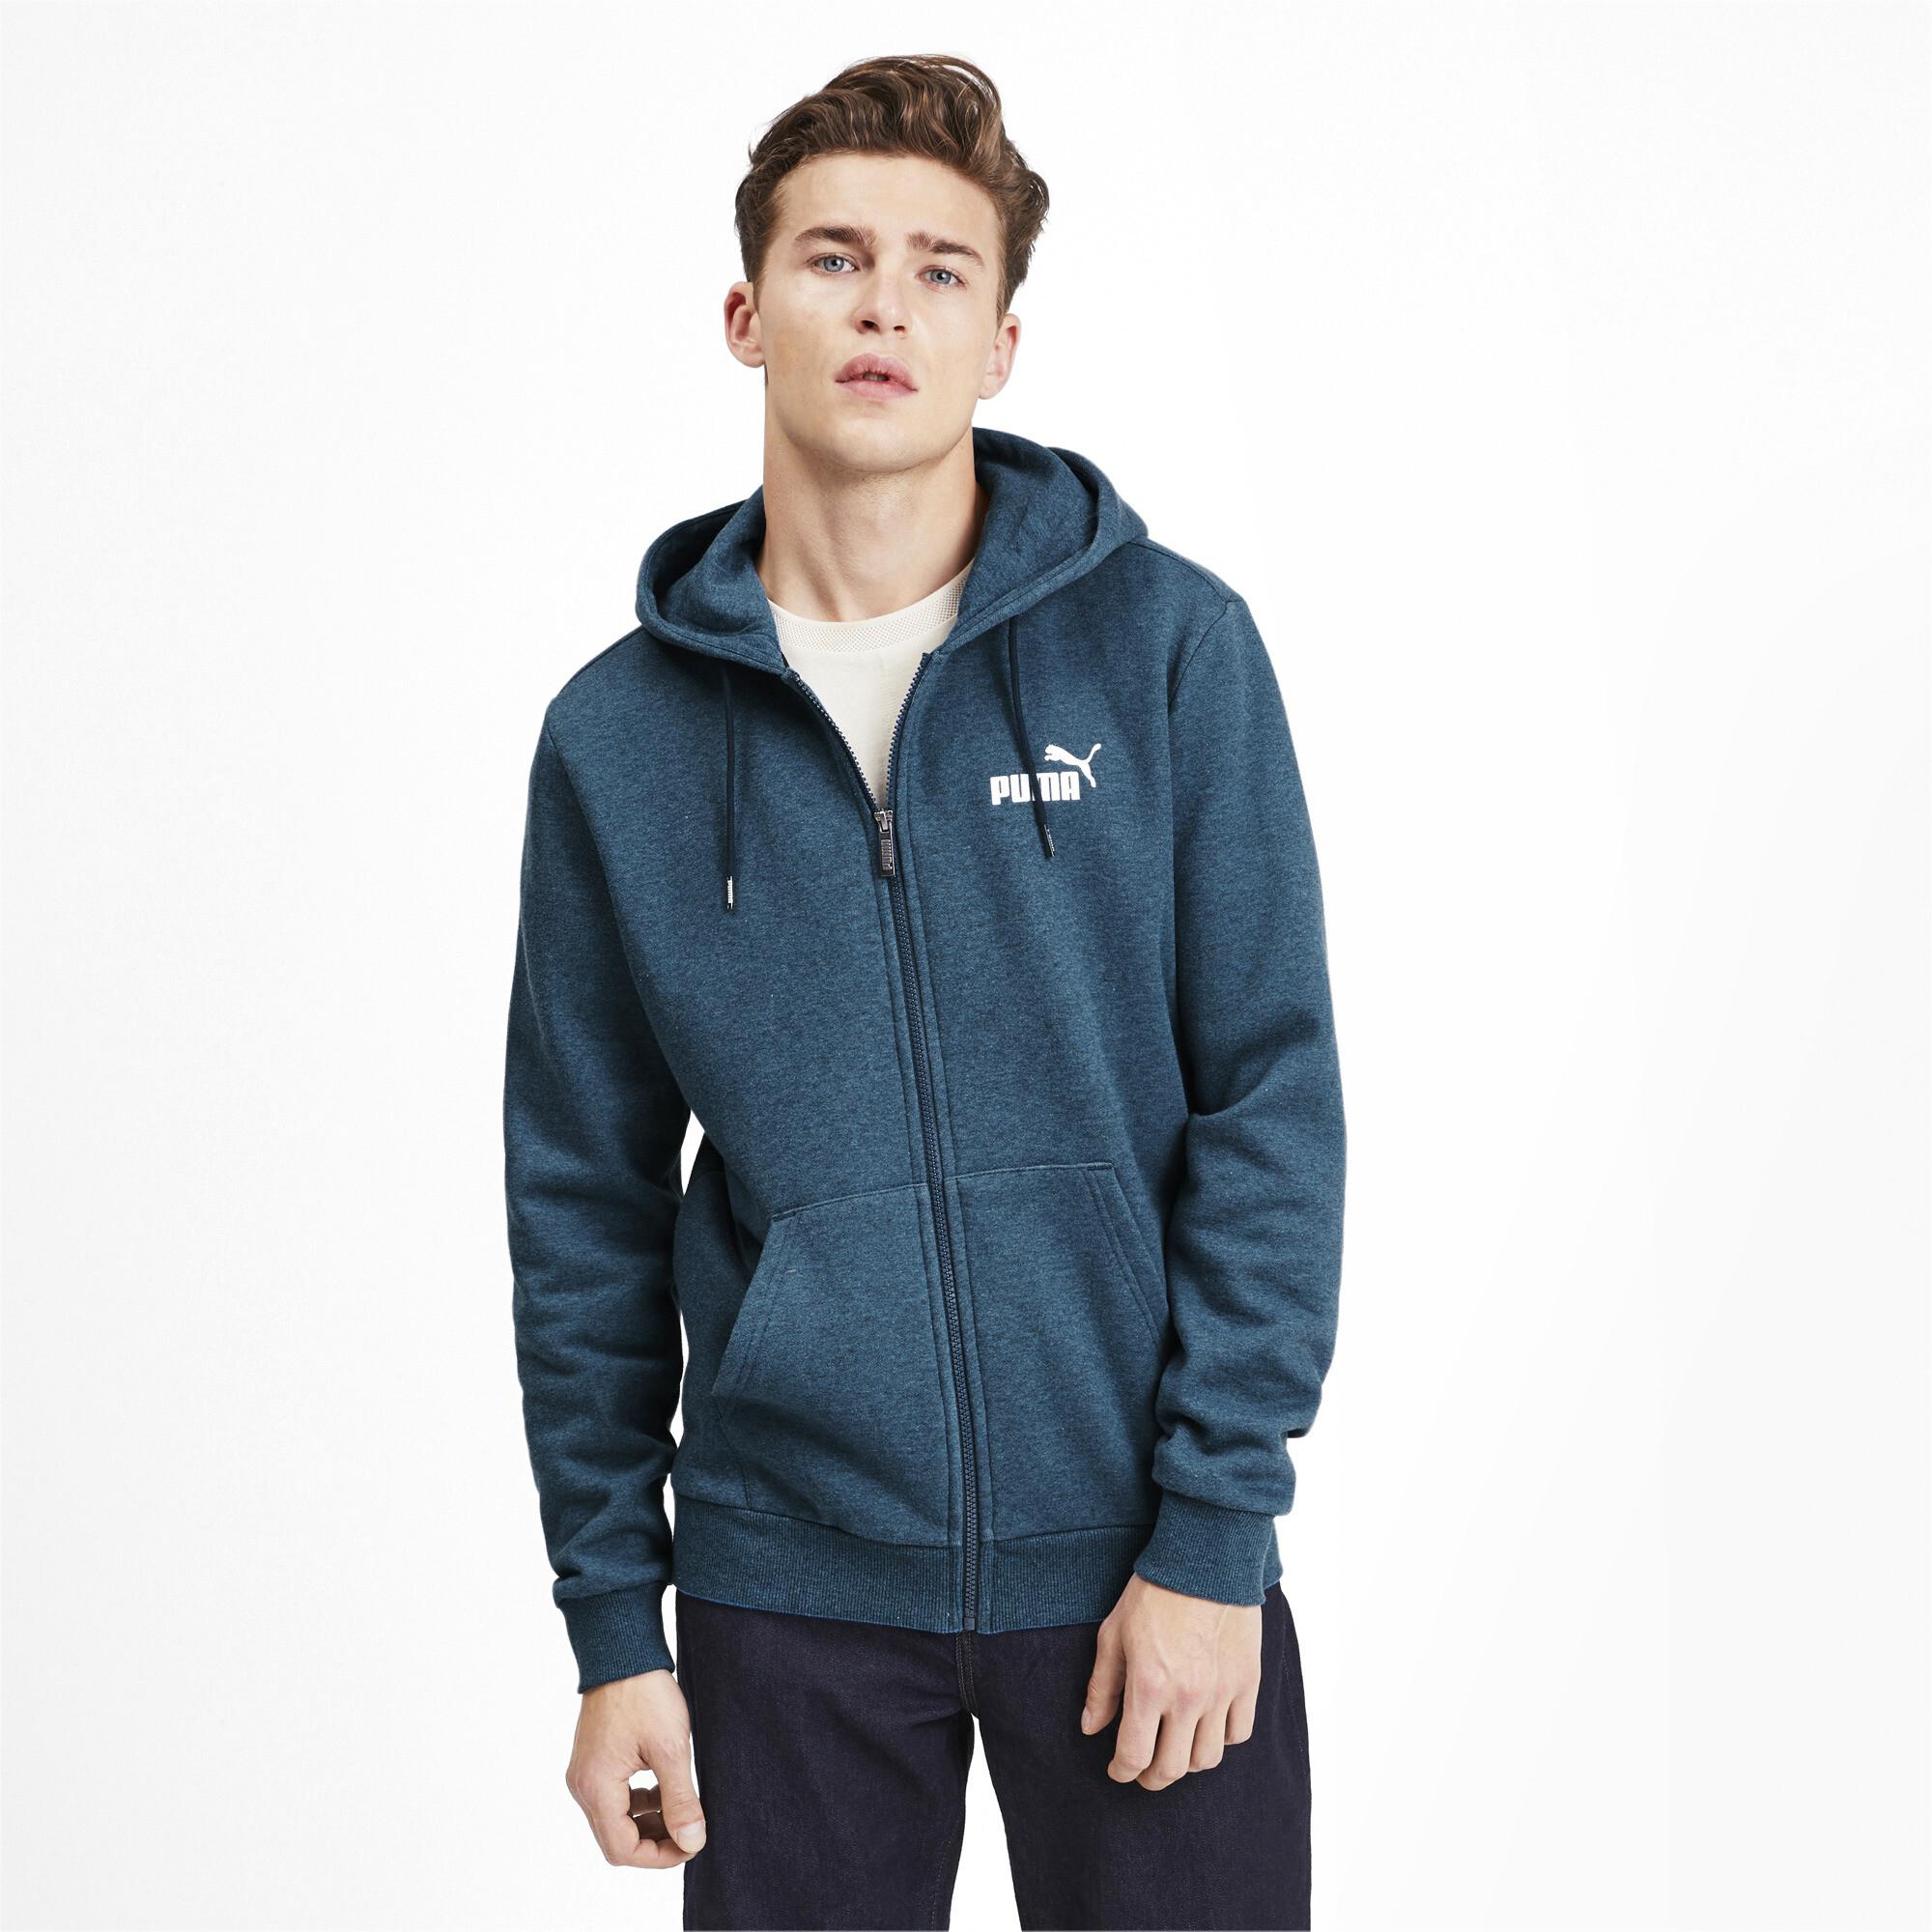 PUMA-Essentials-Men-039-s-Fleece-Hooded-Jacket-Men-Sweat-Basics thumbnail 17